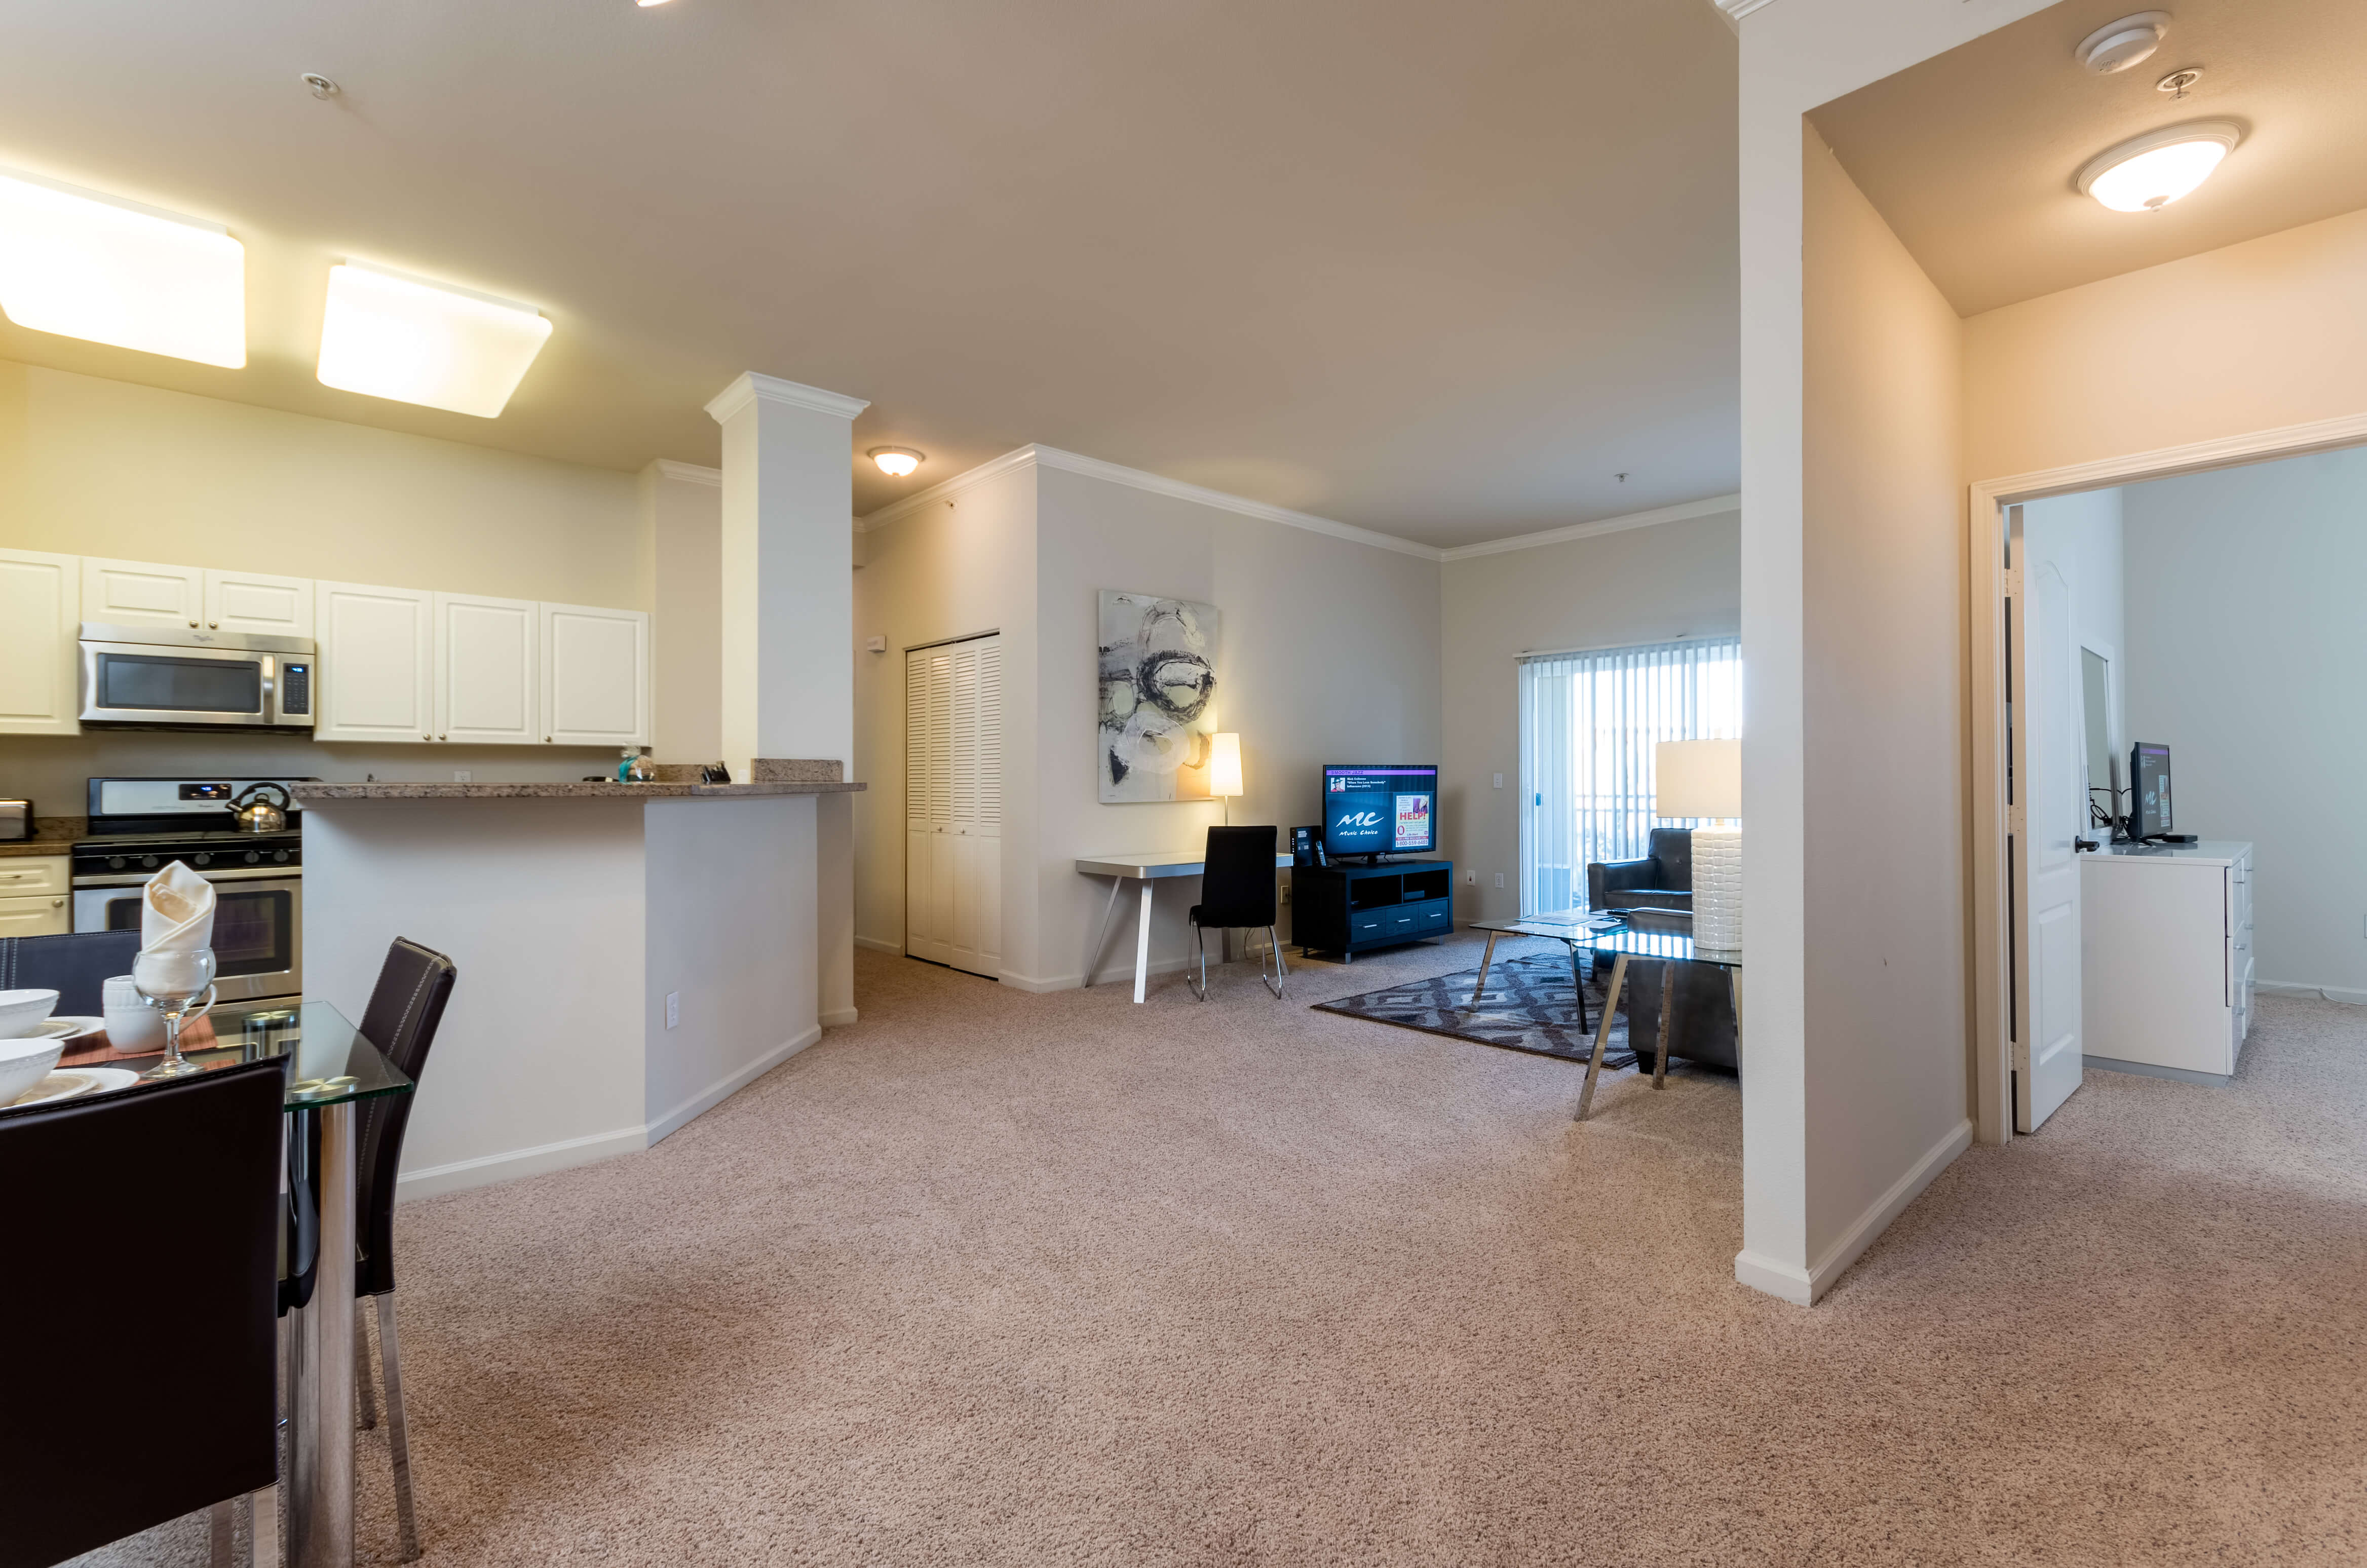 image 2 furnished 3 bedroom Apartment for rent in Santa Clara, Santa Clara County